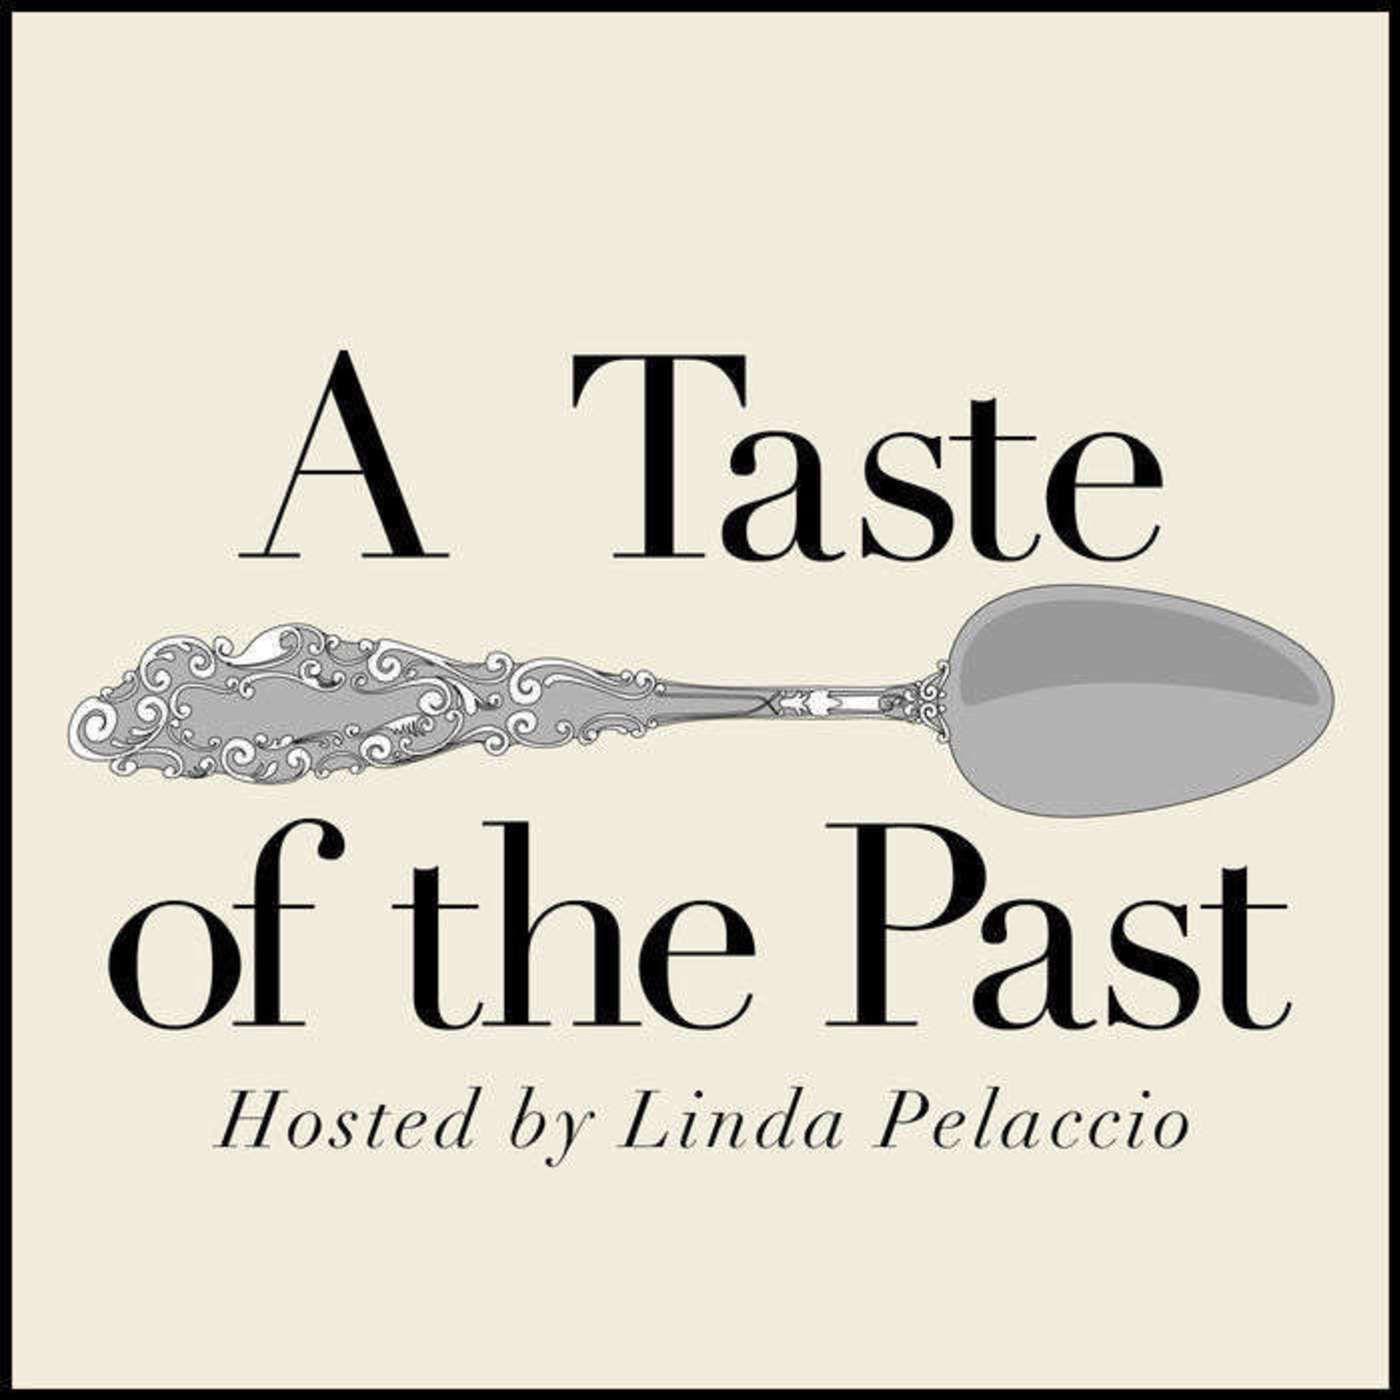 Episode 98: Sheilah Kaufman and Turkish Cuisine